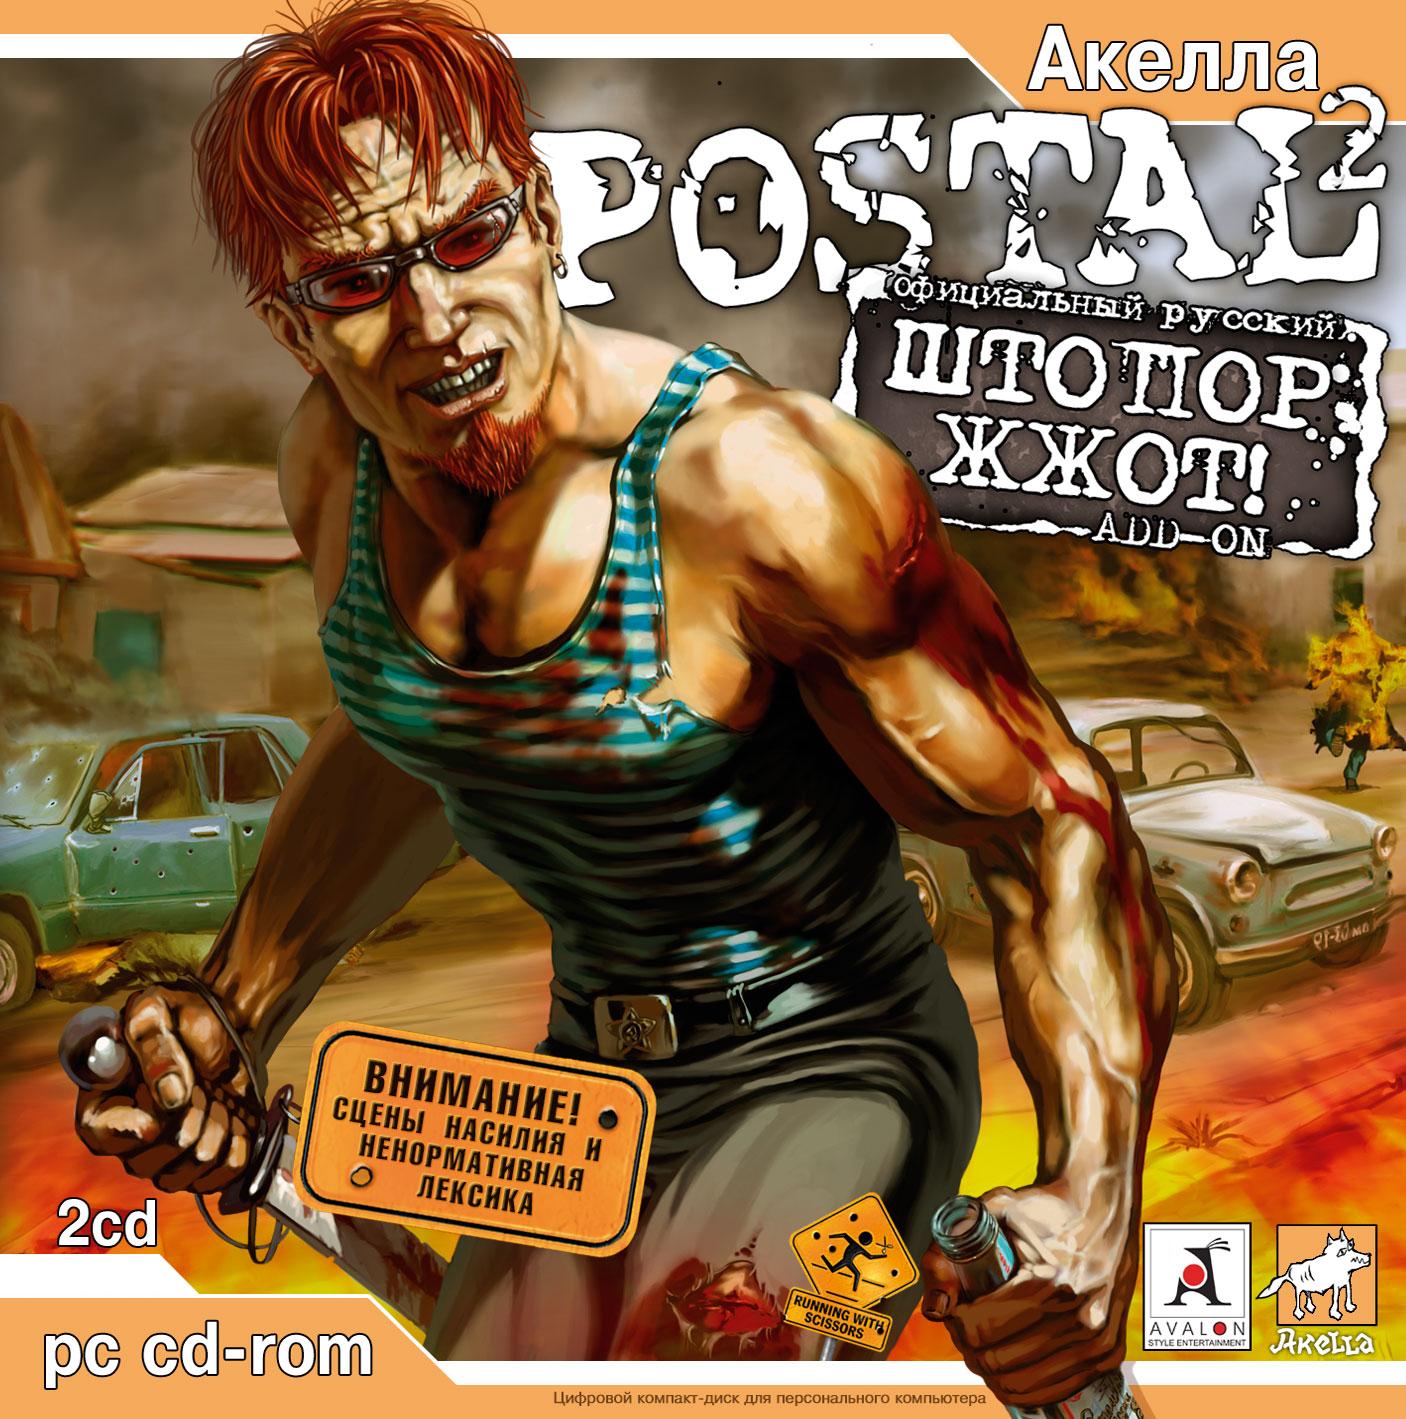 postal 2 game review